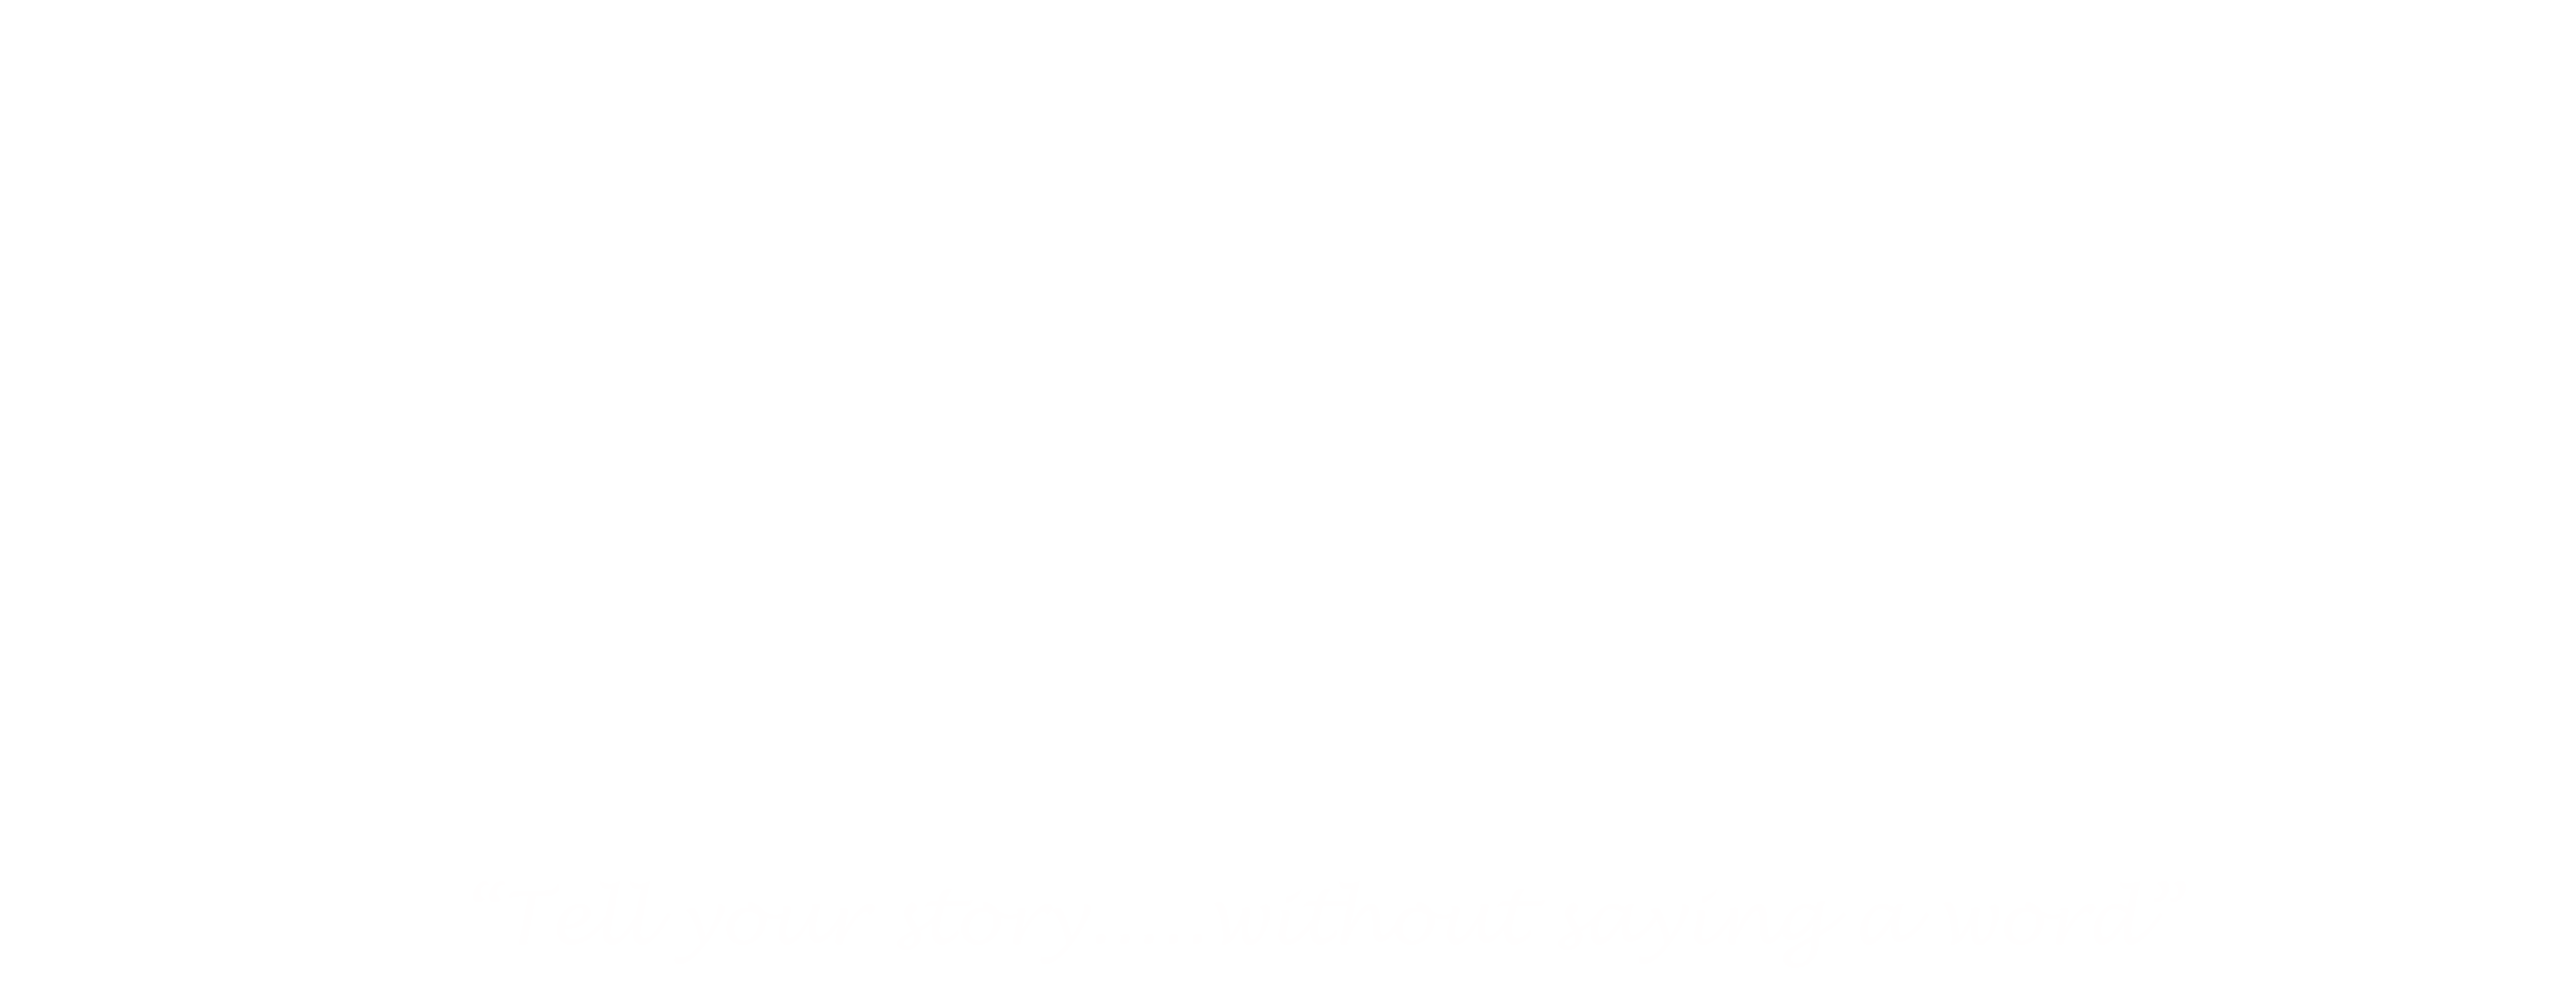 Les Kelly Studios